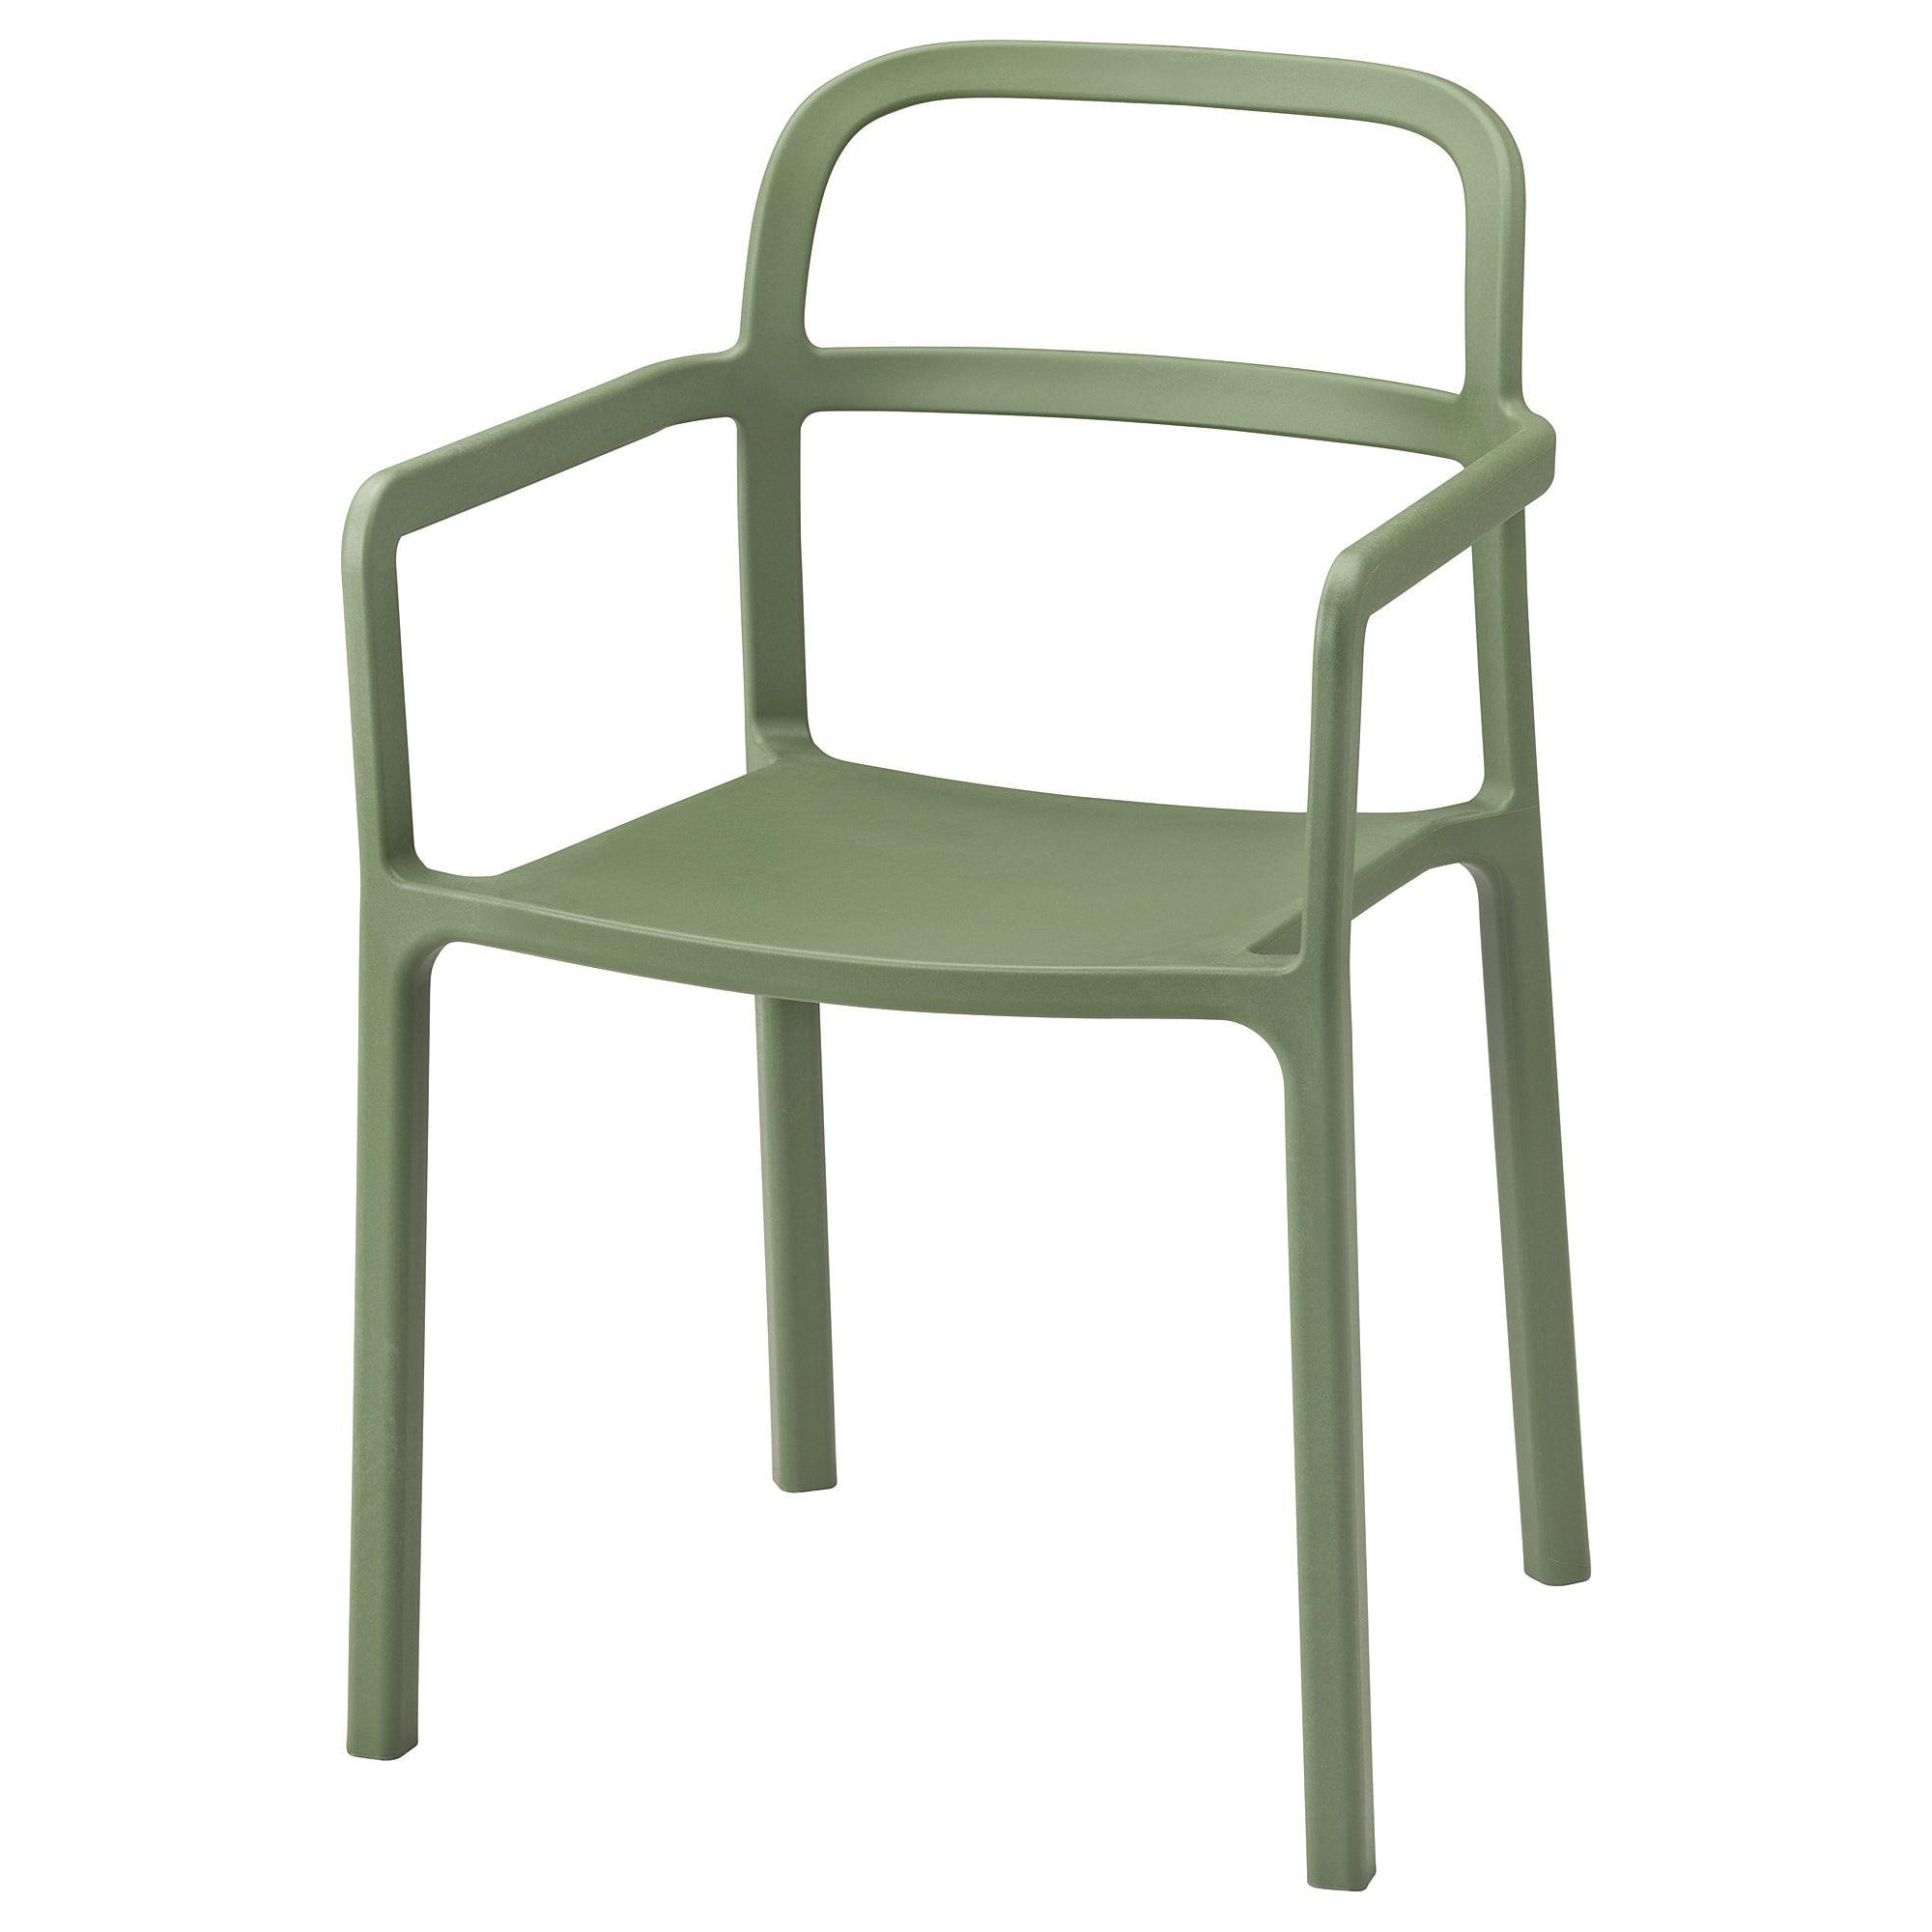 Ypperlig Armchair In Outdoor Green Ikea Ypperlig Outdoor